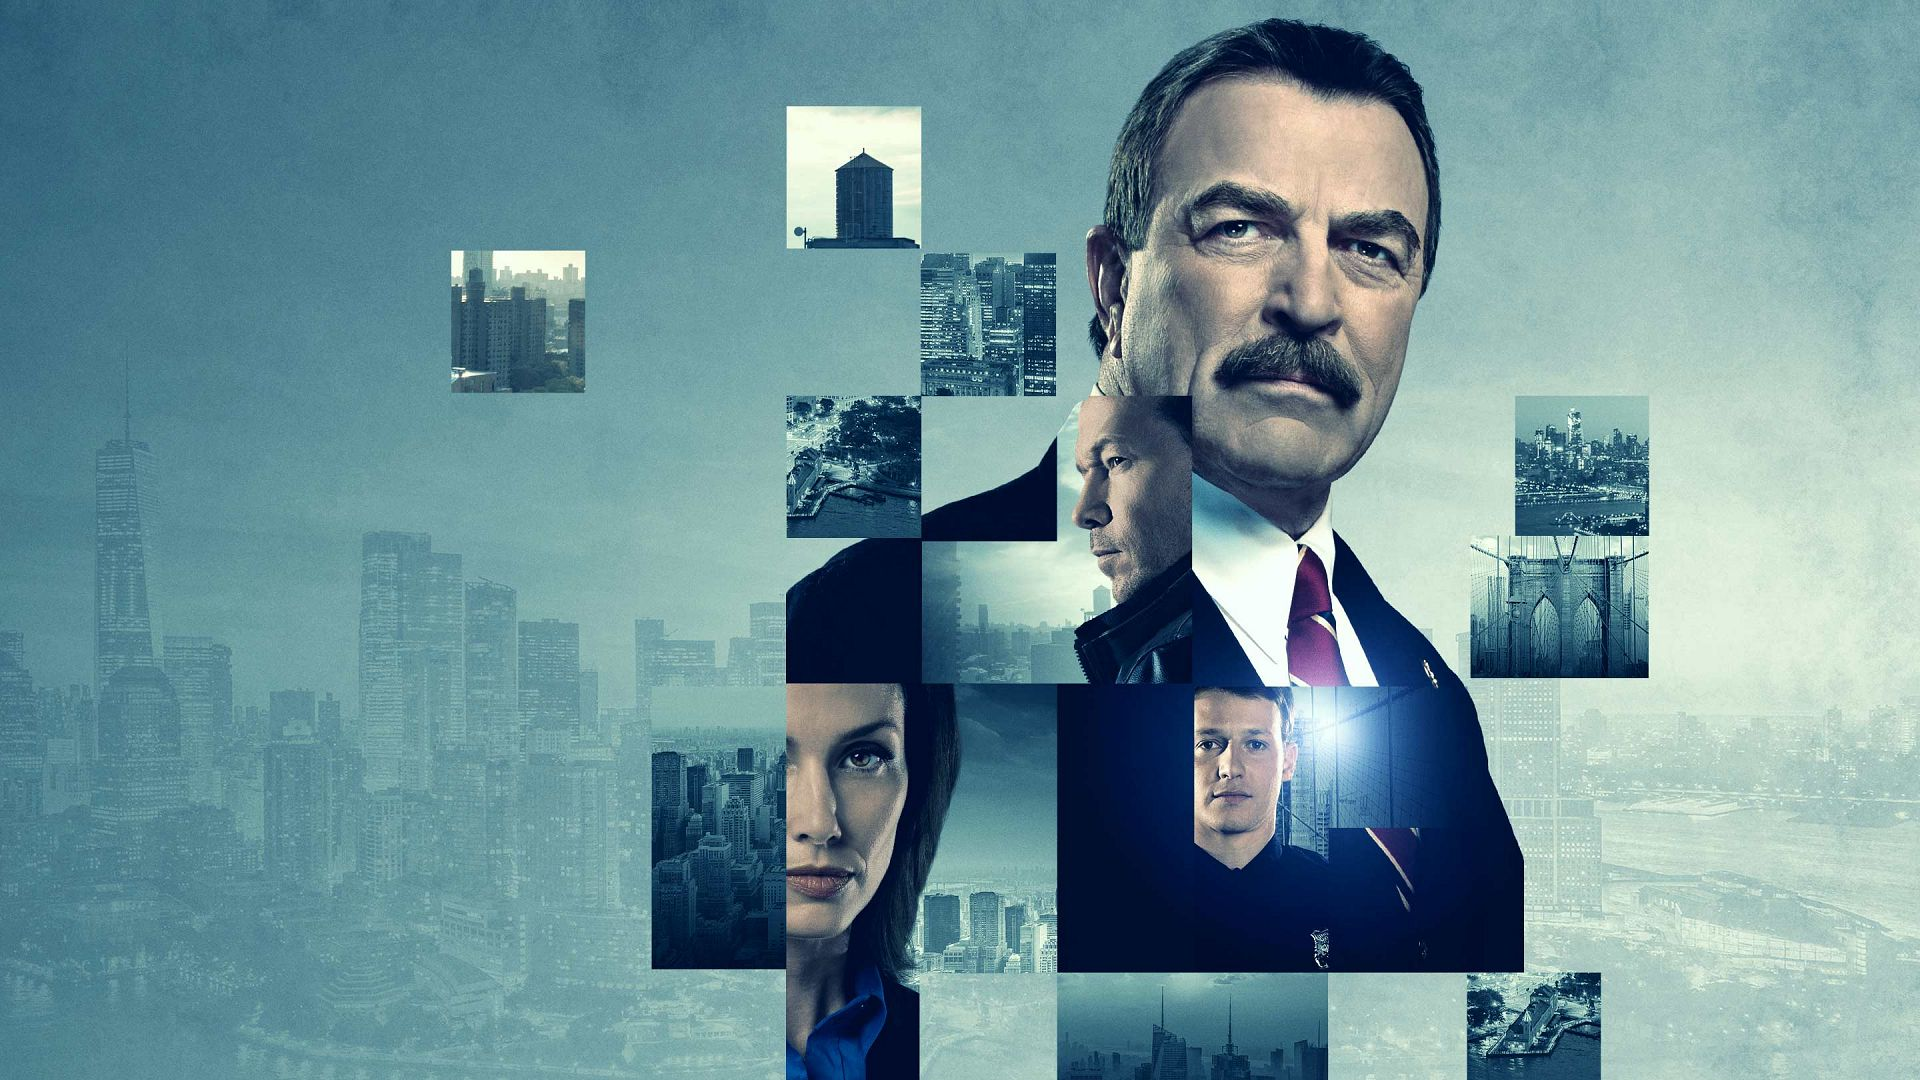 Blue Bloods Season 12 Episode 1